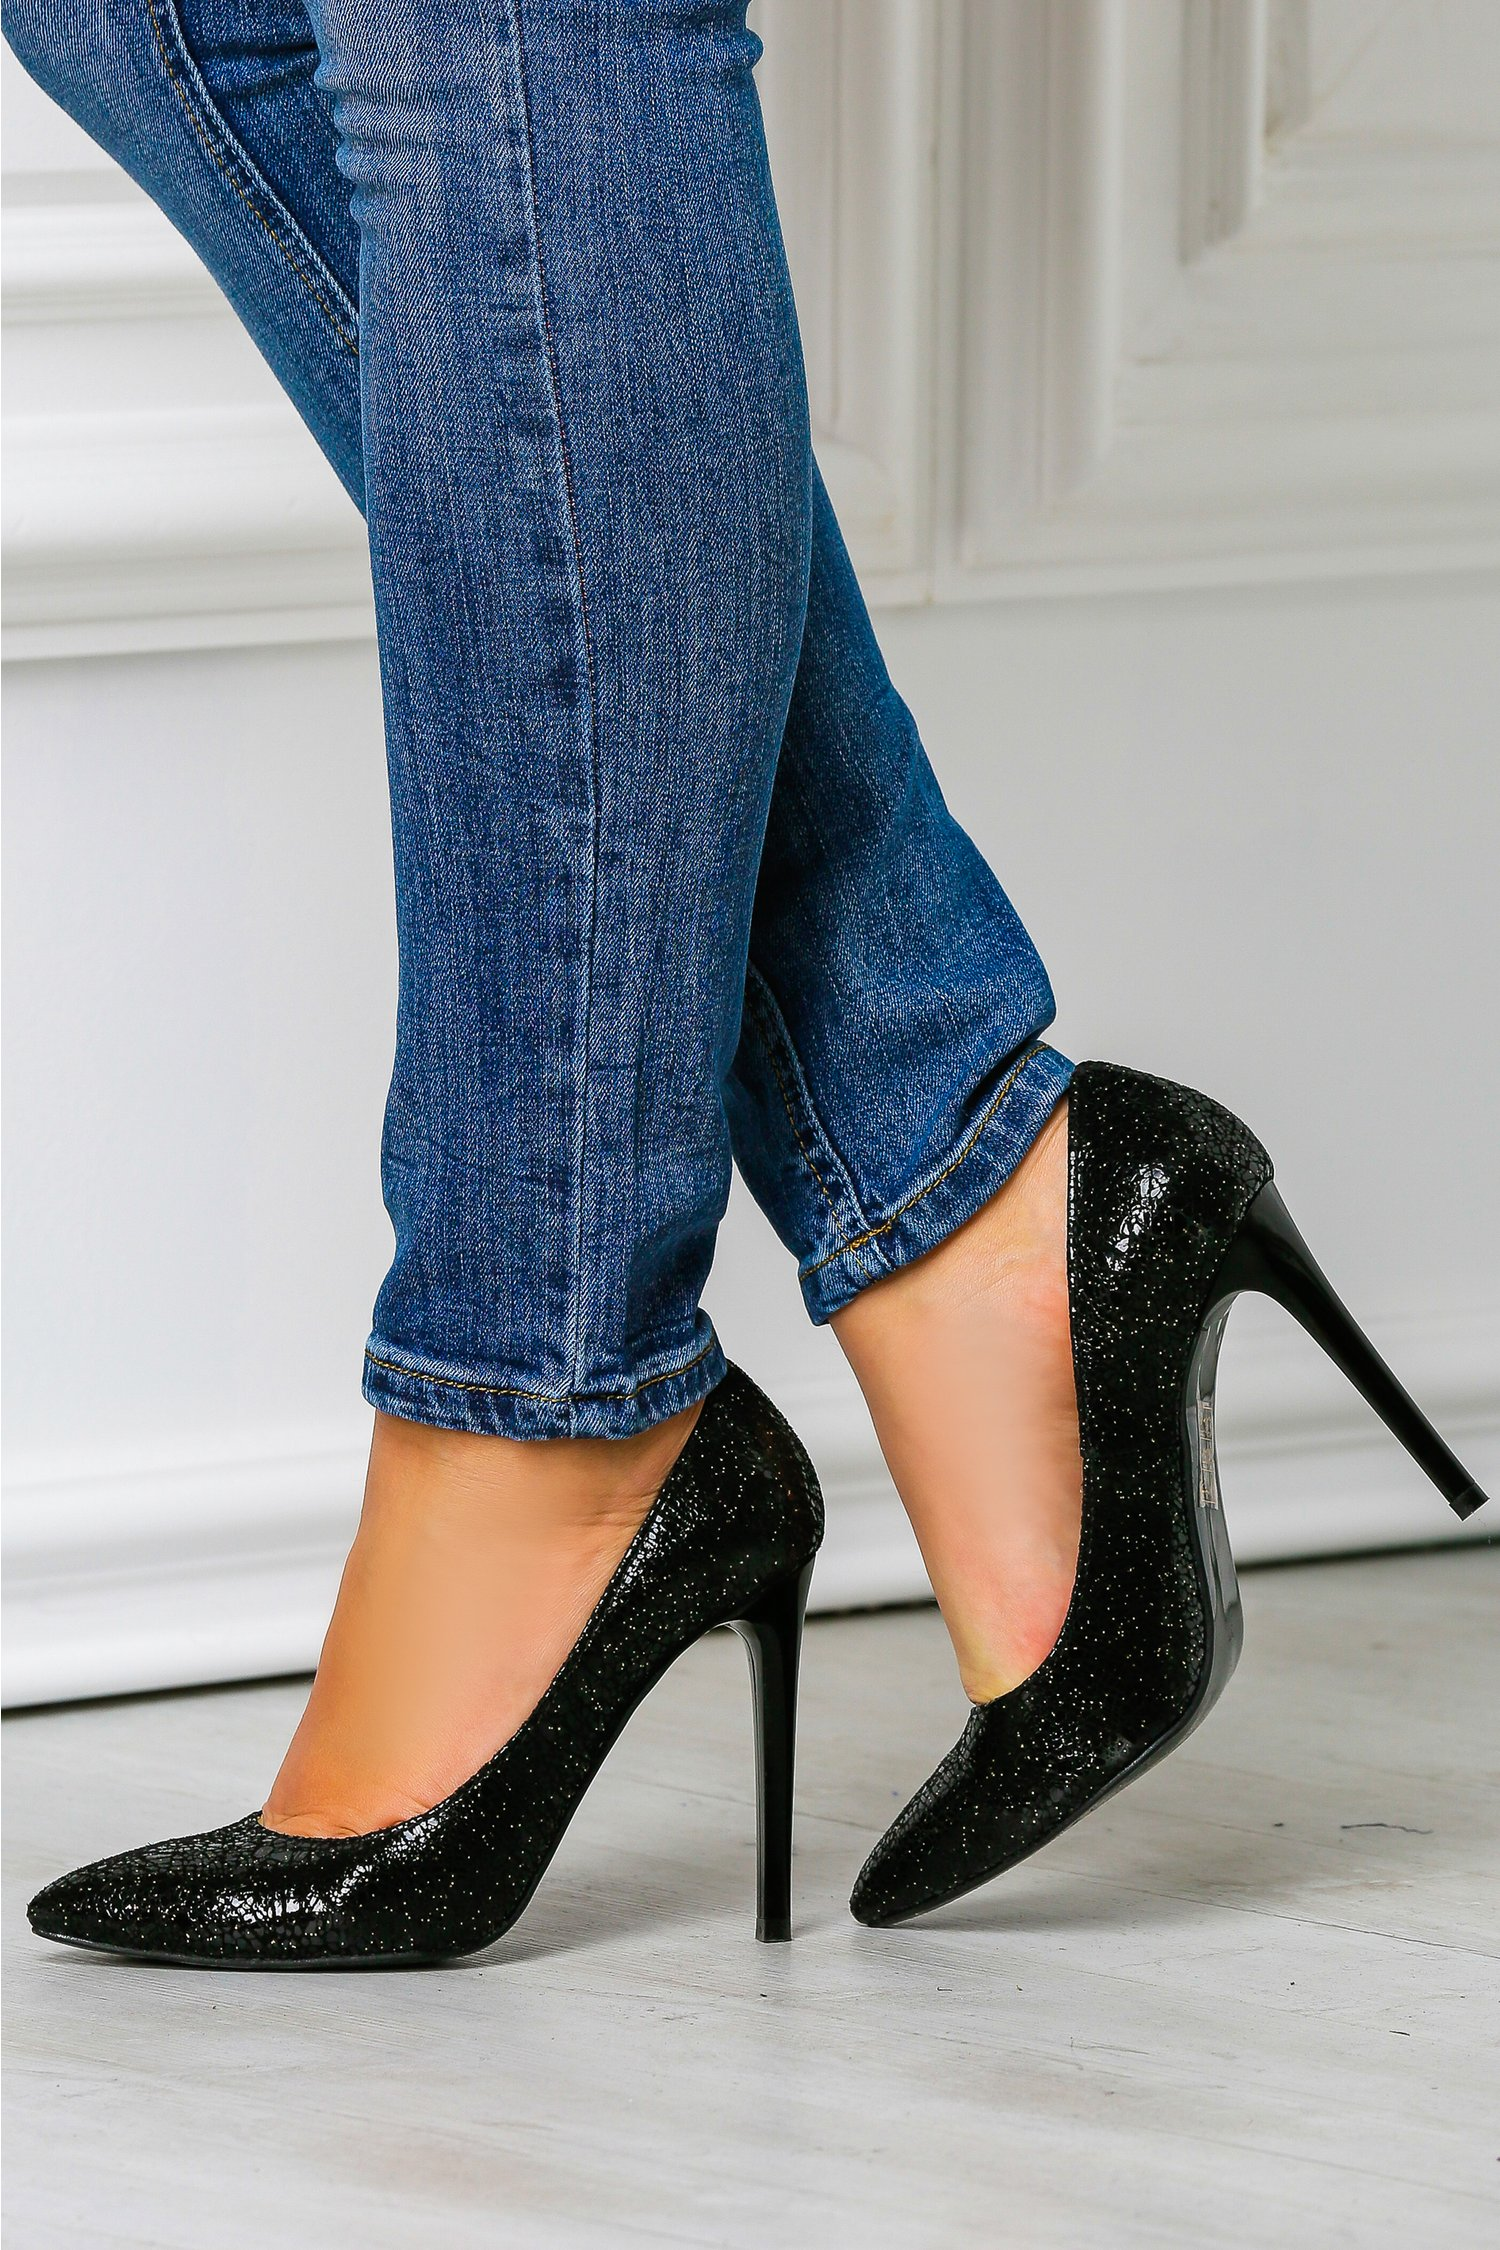 Pantofi dama stiletto negri de ocazie toc inalt, colectia 2018